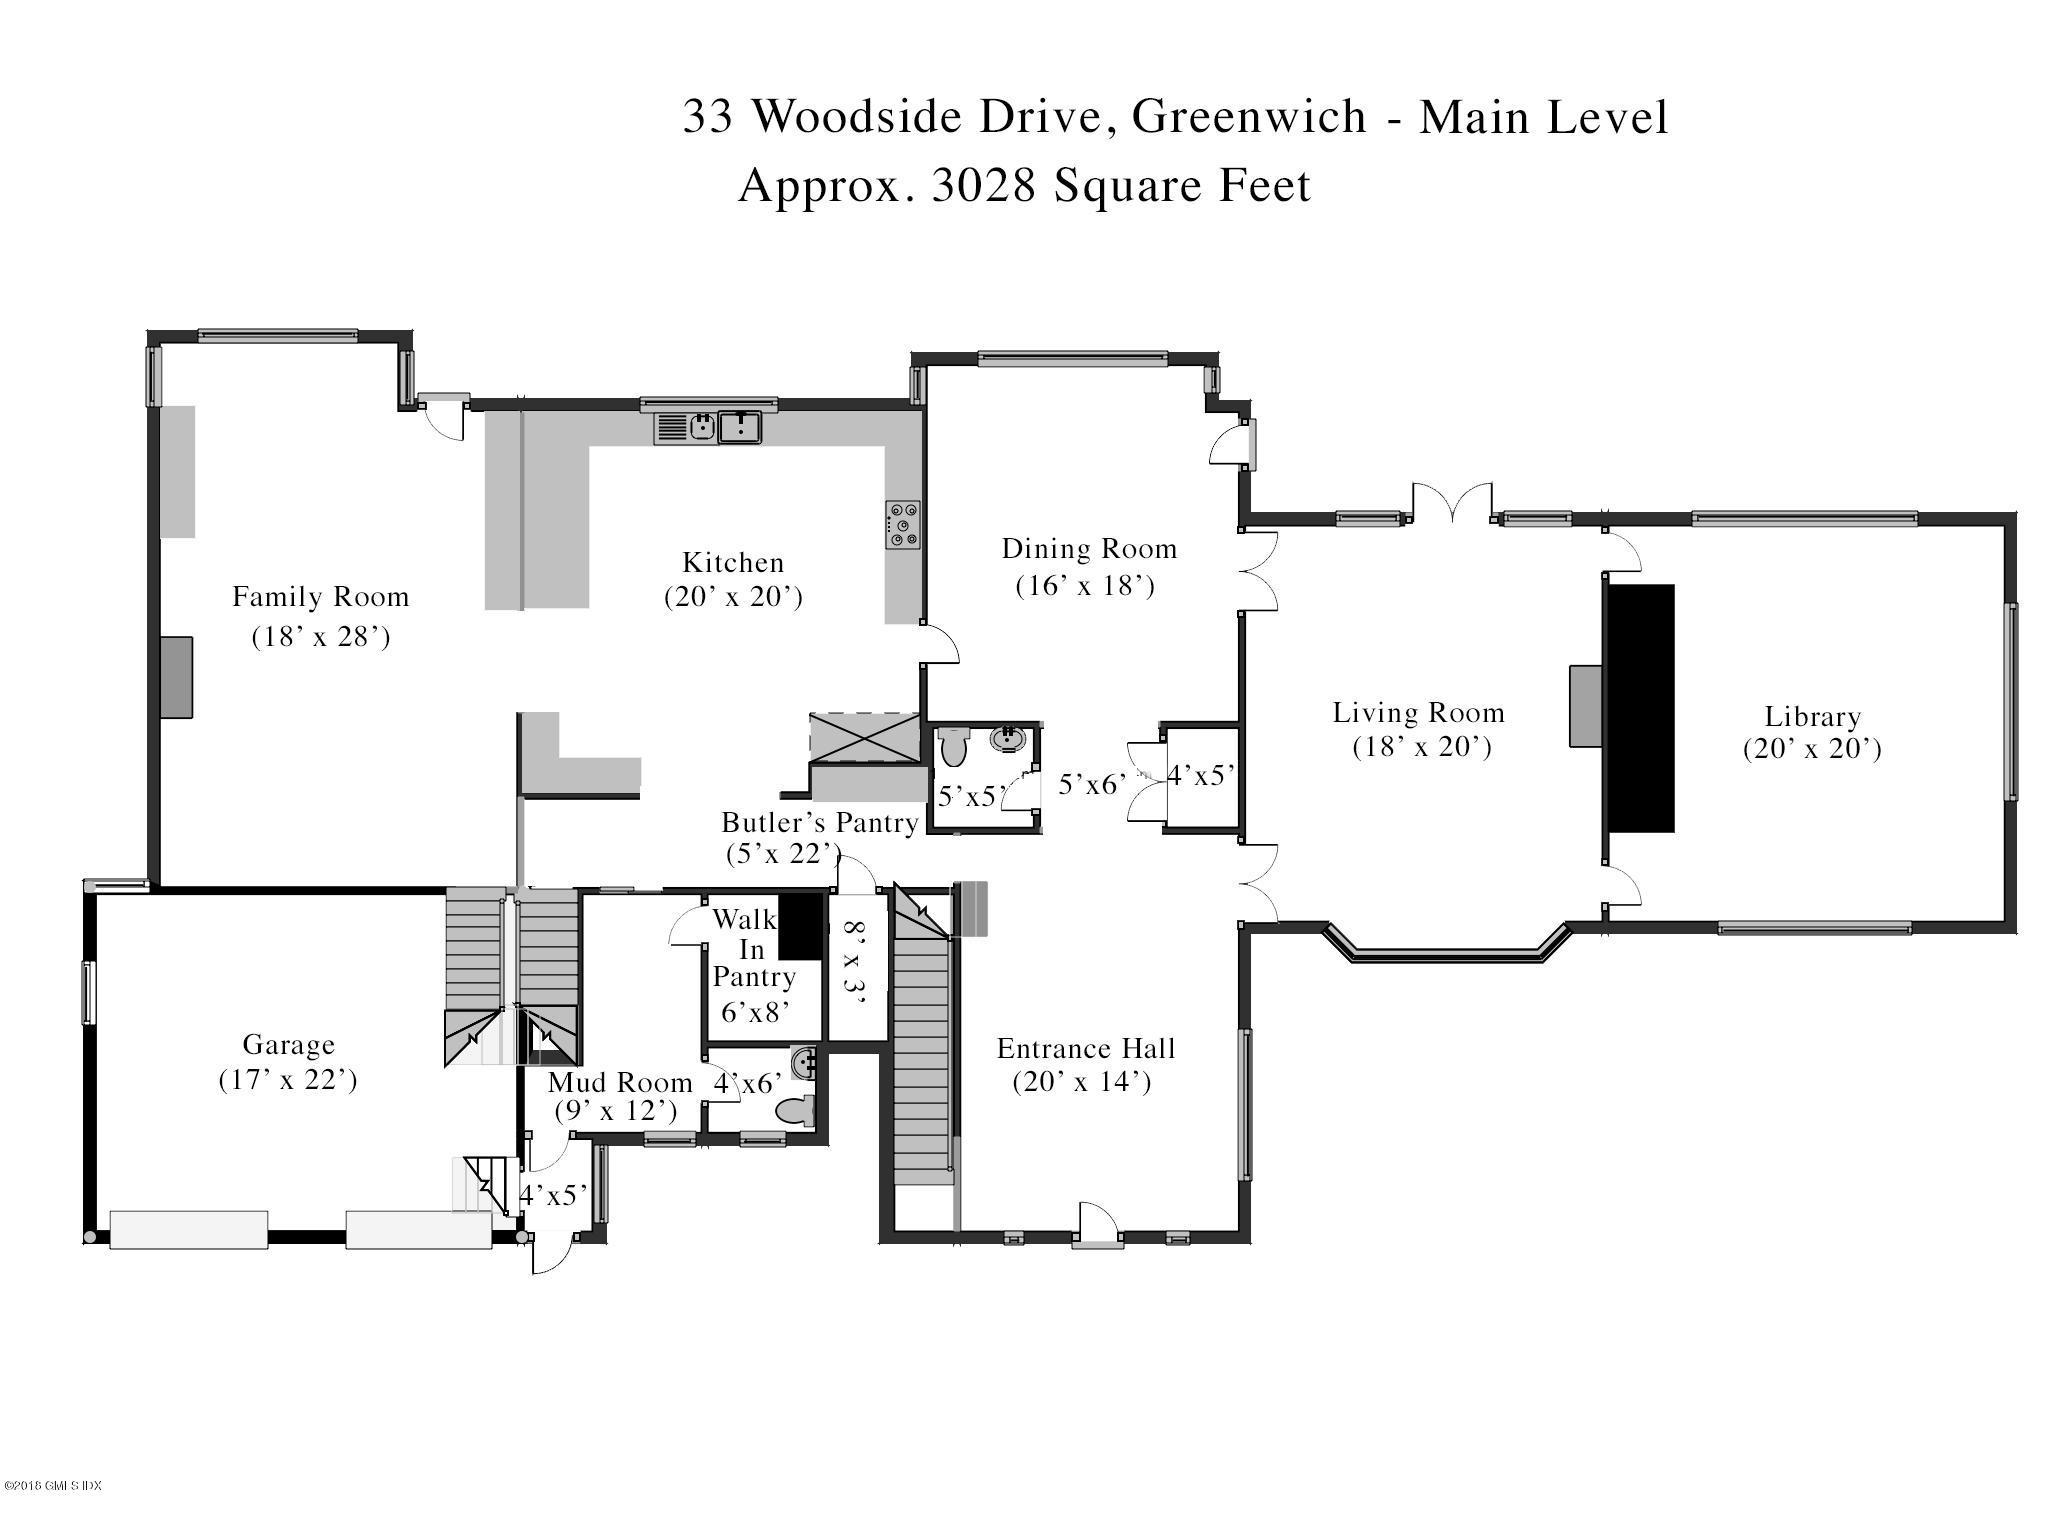 33 Woodside Drive, Greenwich, CT 06830